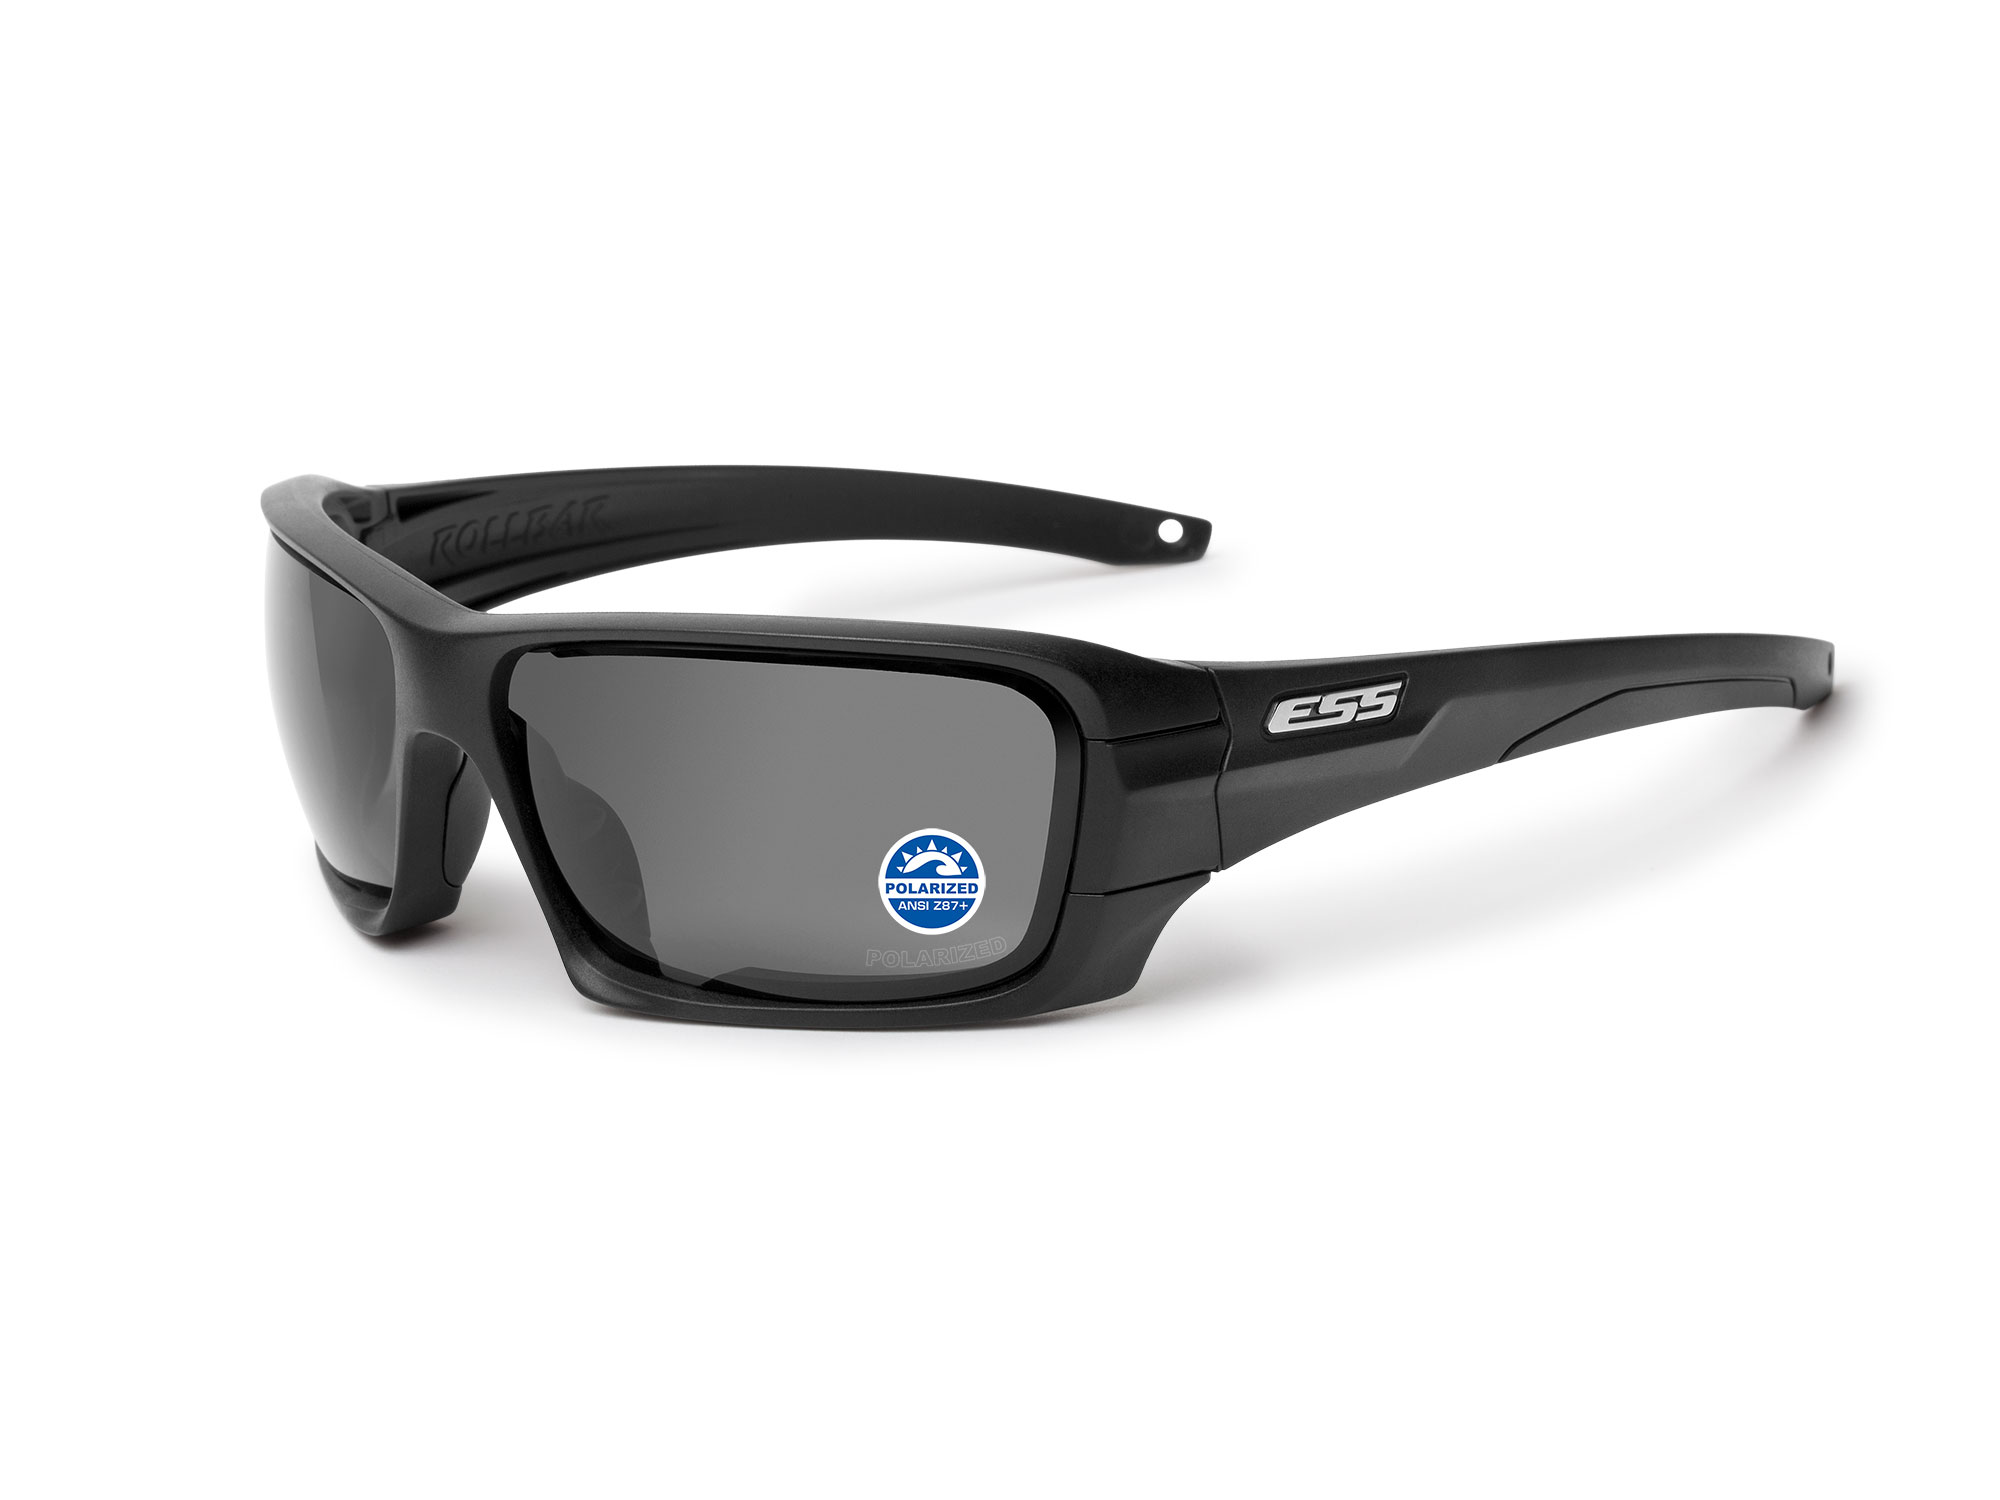 EE9018-04 フレーム:ブラック、レンズ:偏光ミラーグレイ / シルバーLOGO